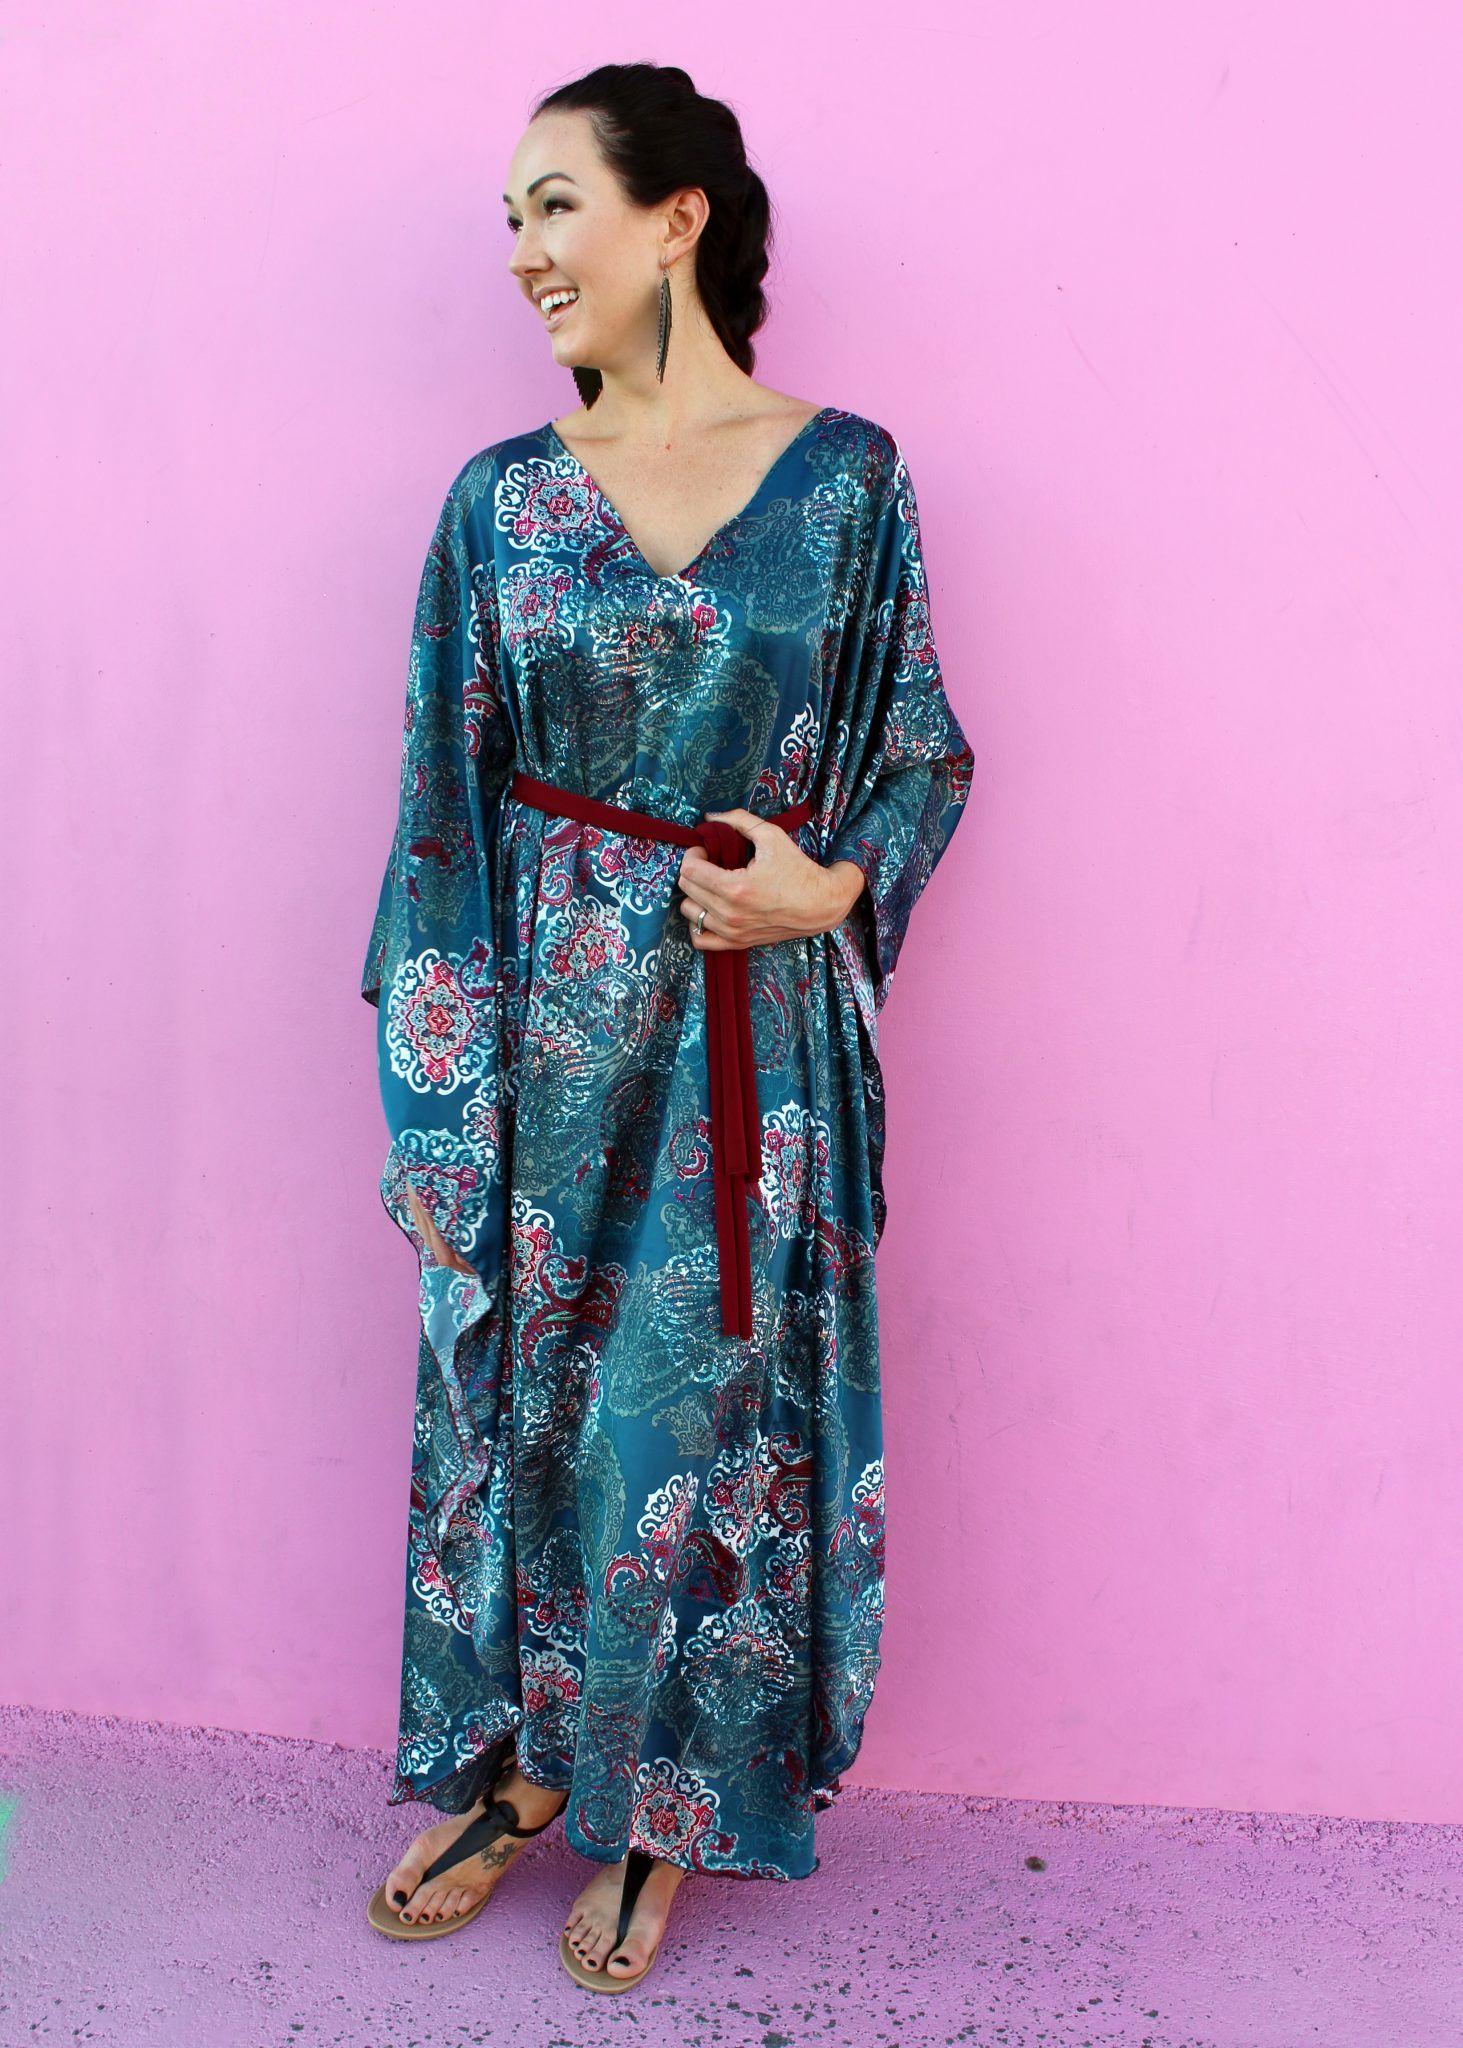 Easy Diy Caftan Dress Tutorial For Spring Creative Fashion Blog Kaftan Pattern Caftan Dress Dress Patterns Diy [ 2048 x 1463 Pixel ]